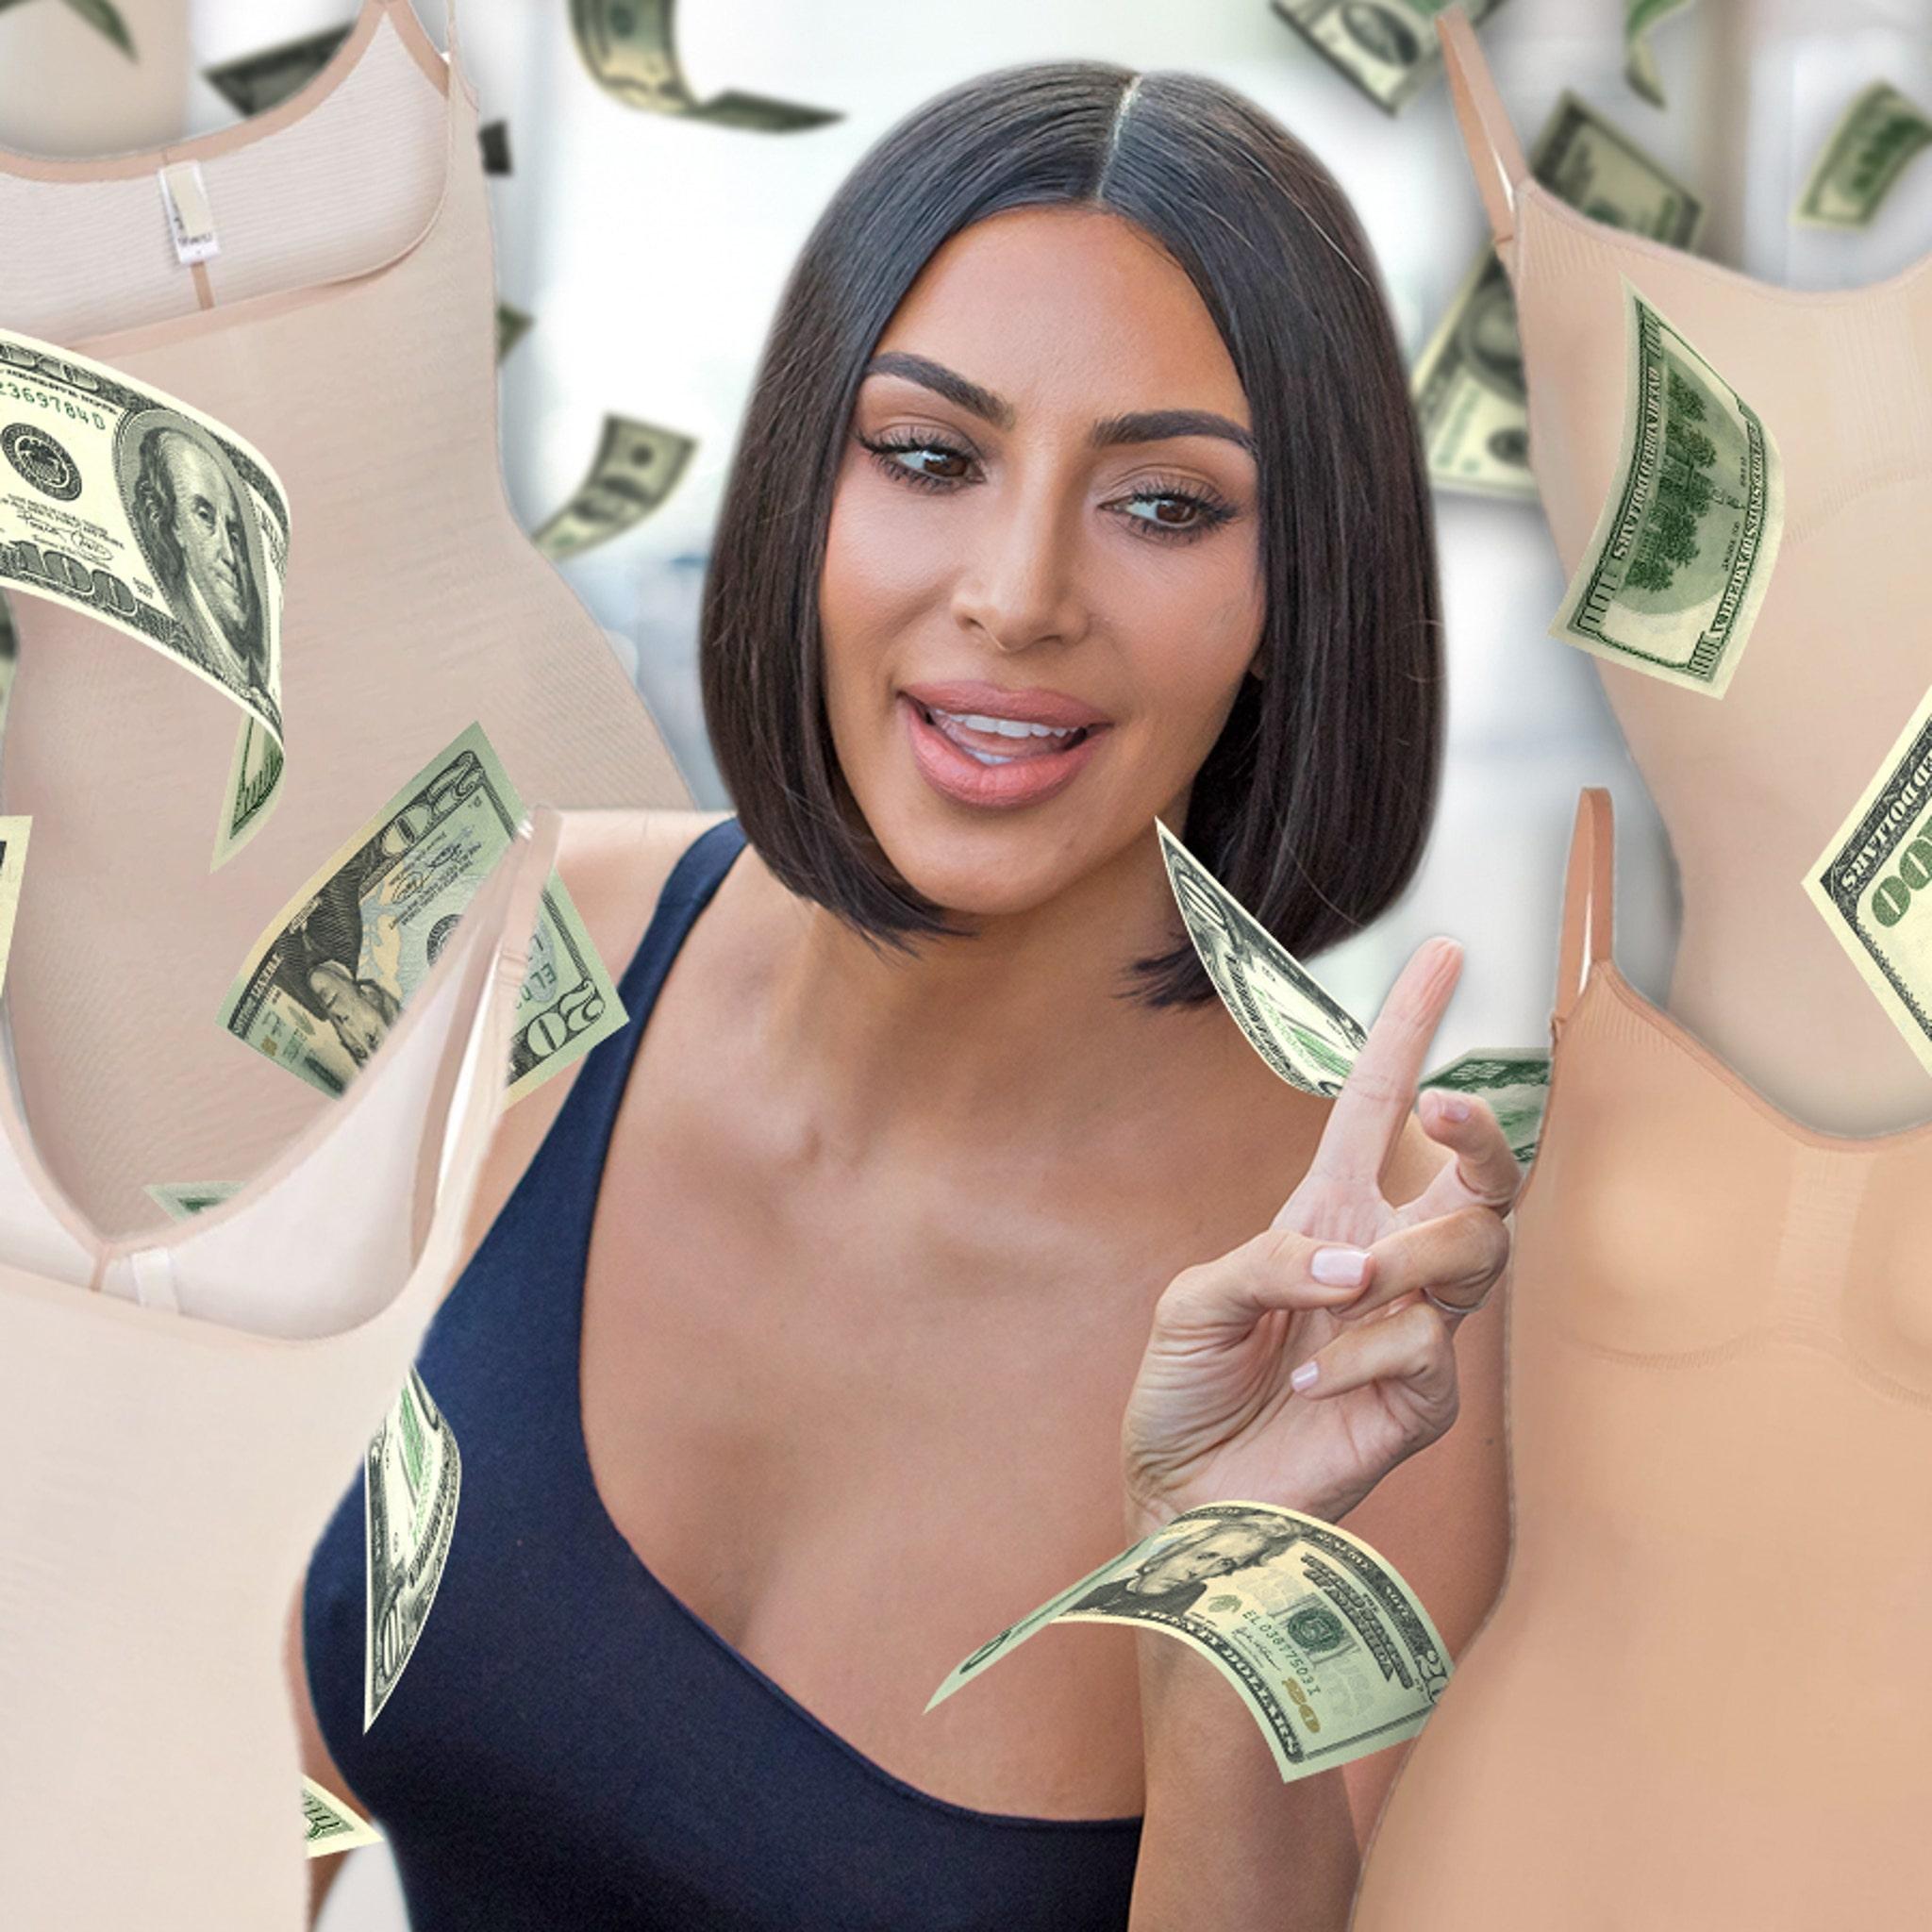 Kim Kardashian's SKIMS Launch Made $2 Million Within Minutes